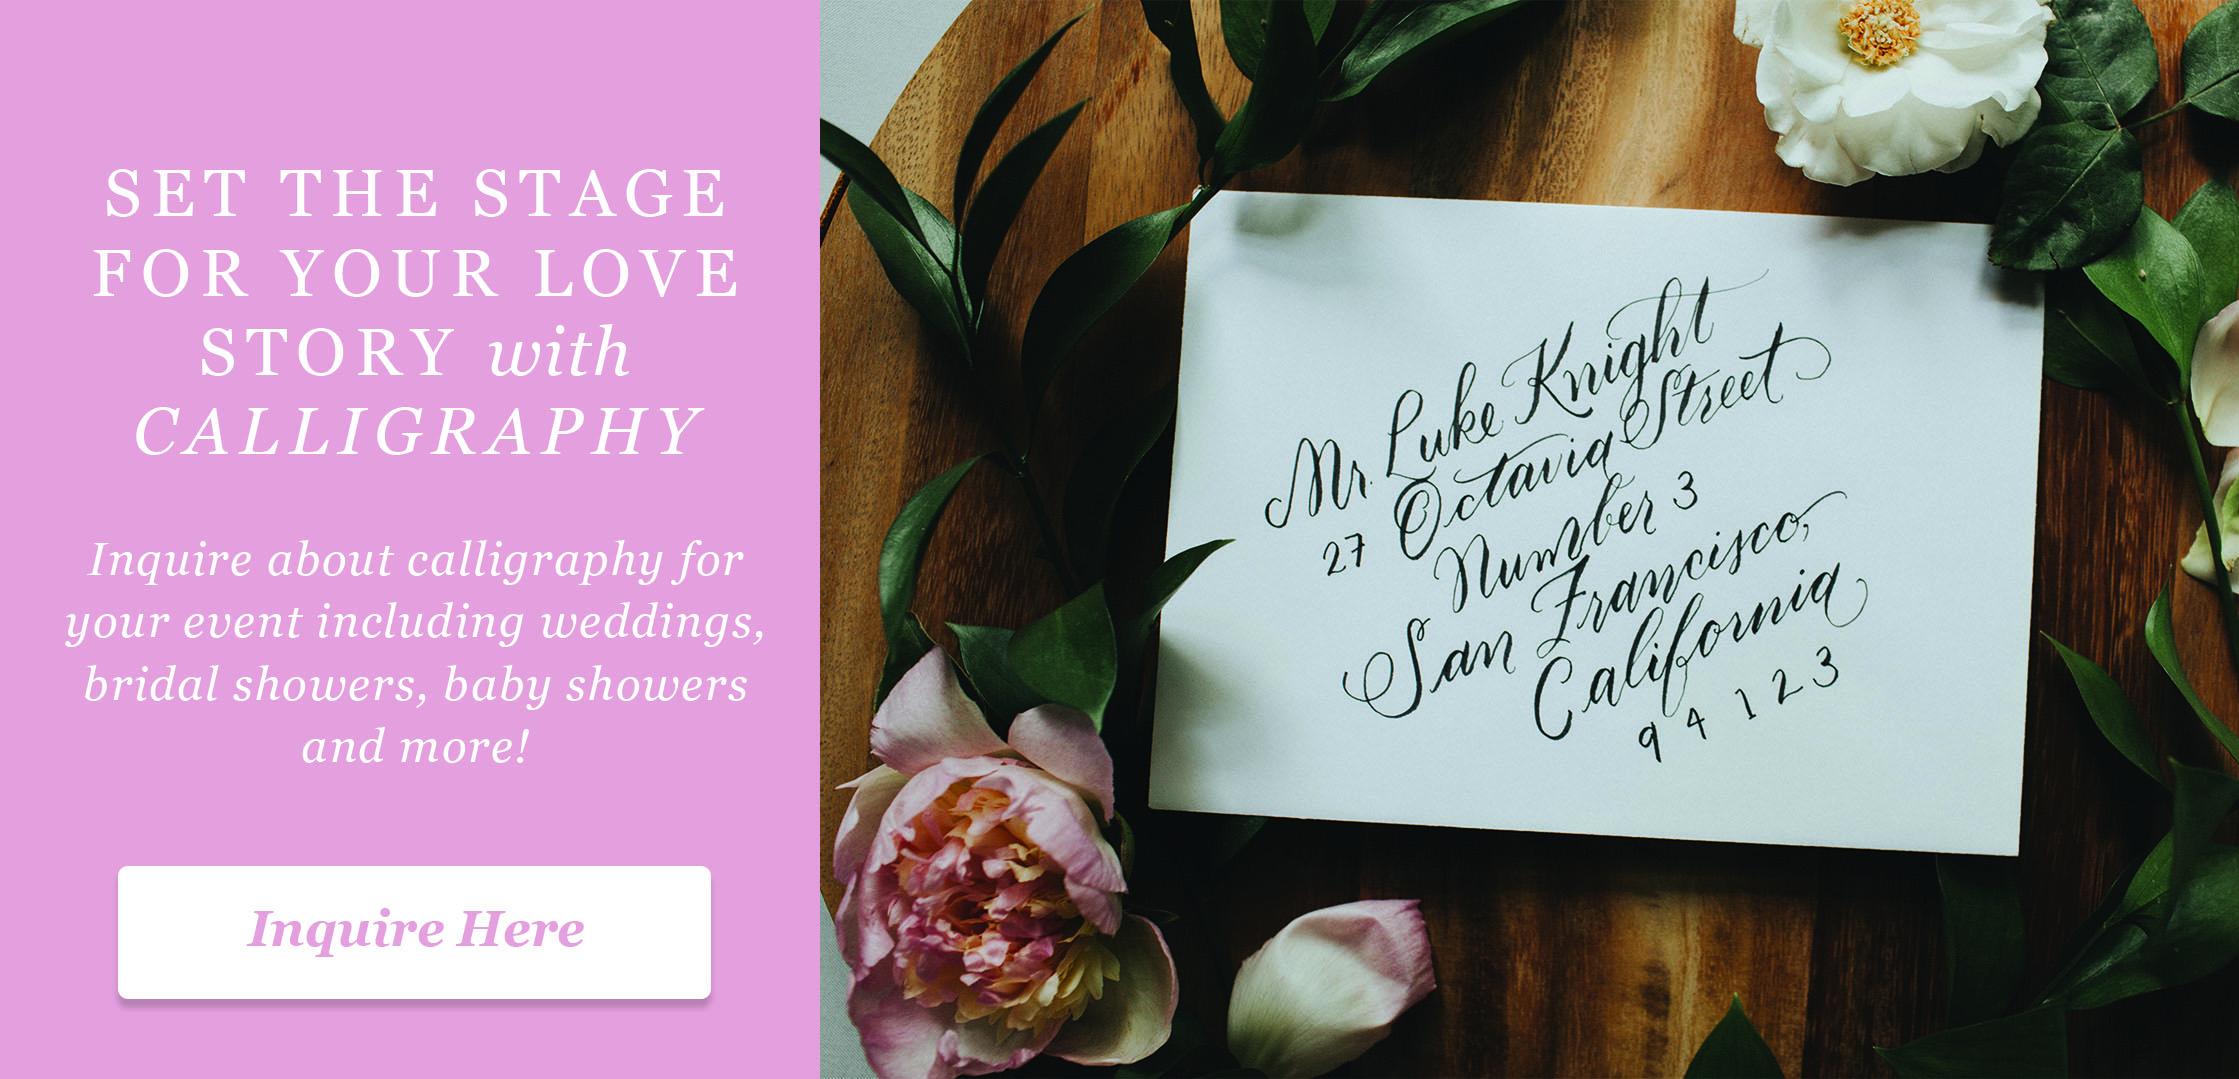 WebsiteBanner_Calligraphy_LinaLuluPaperie.jpg